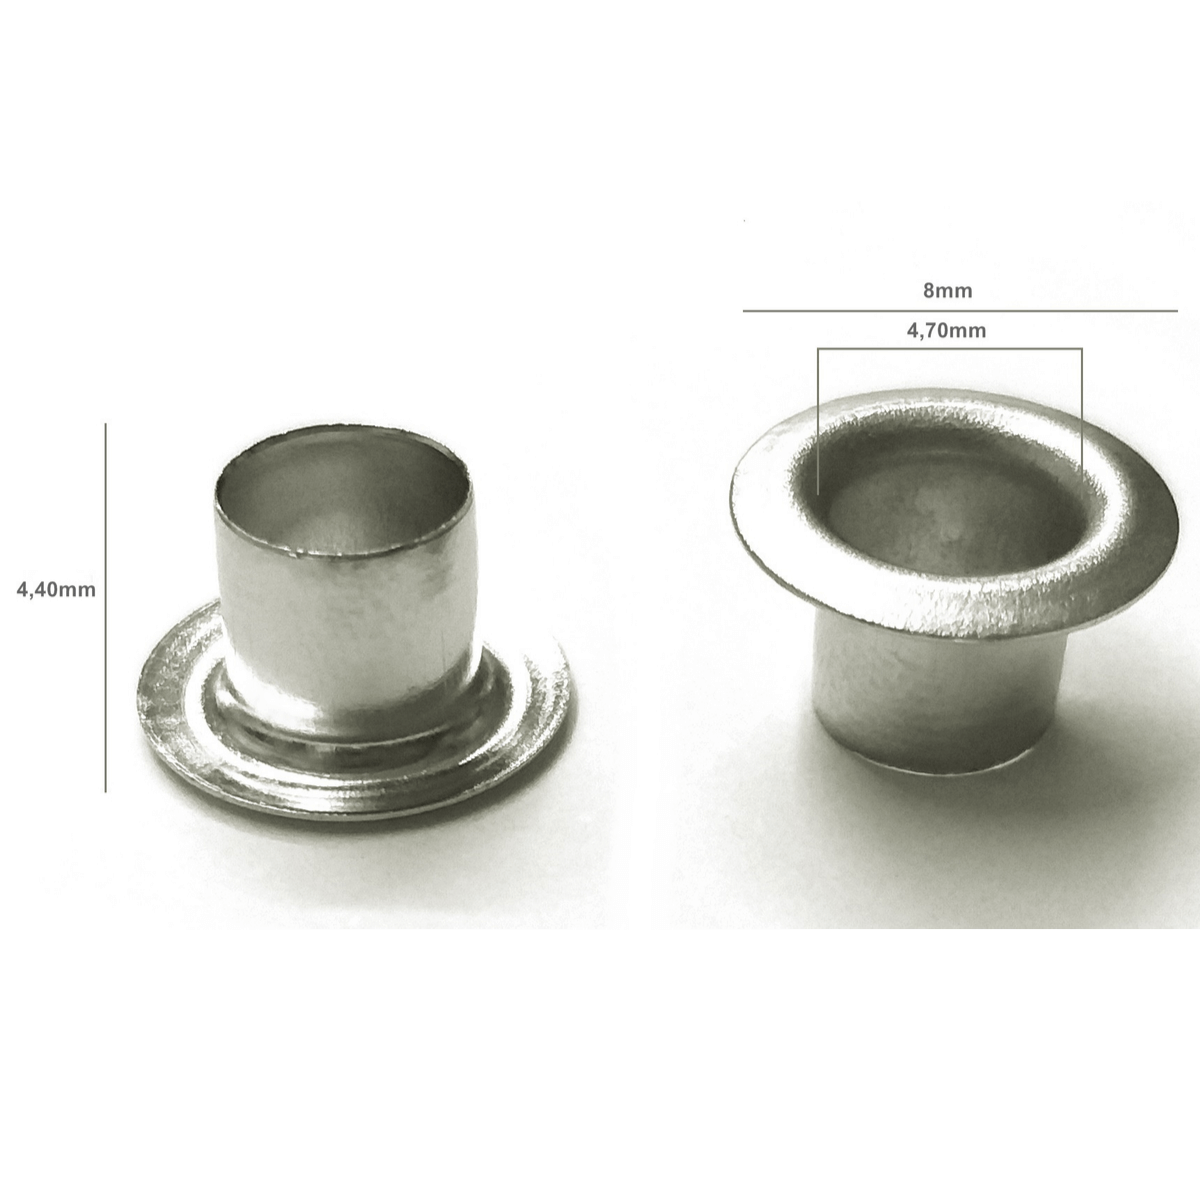 Ilhós Alumínio Vermelho Nº 54 8mm de diâmetro externo